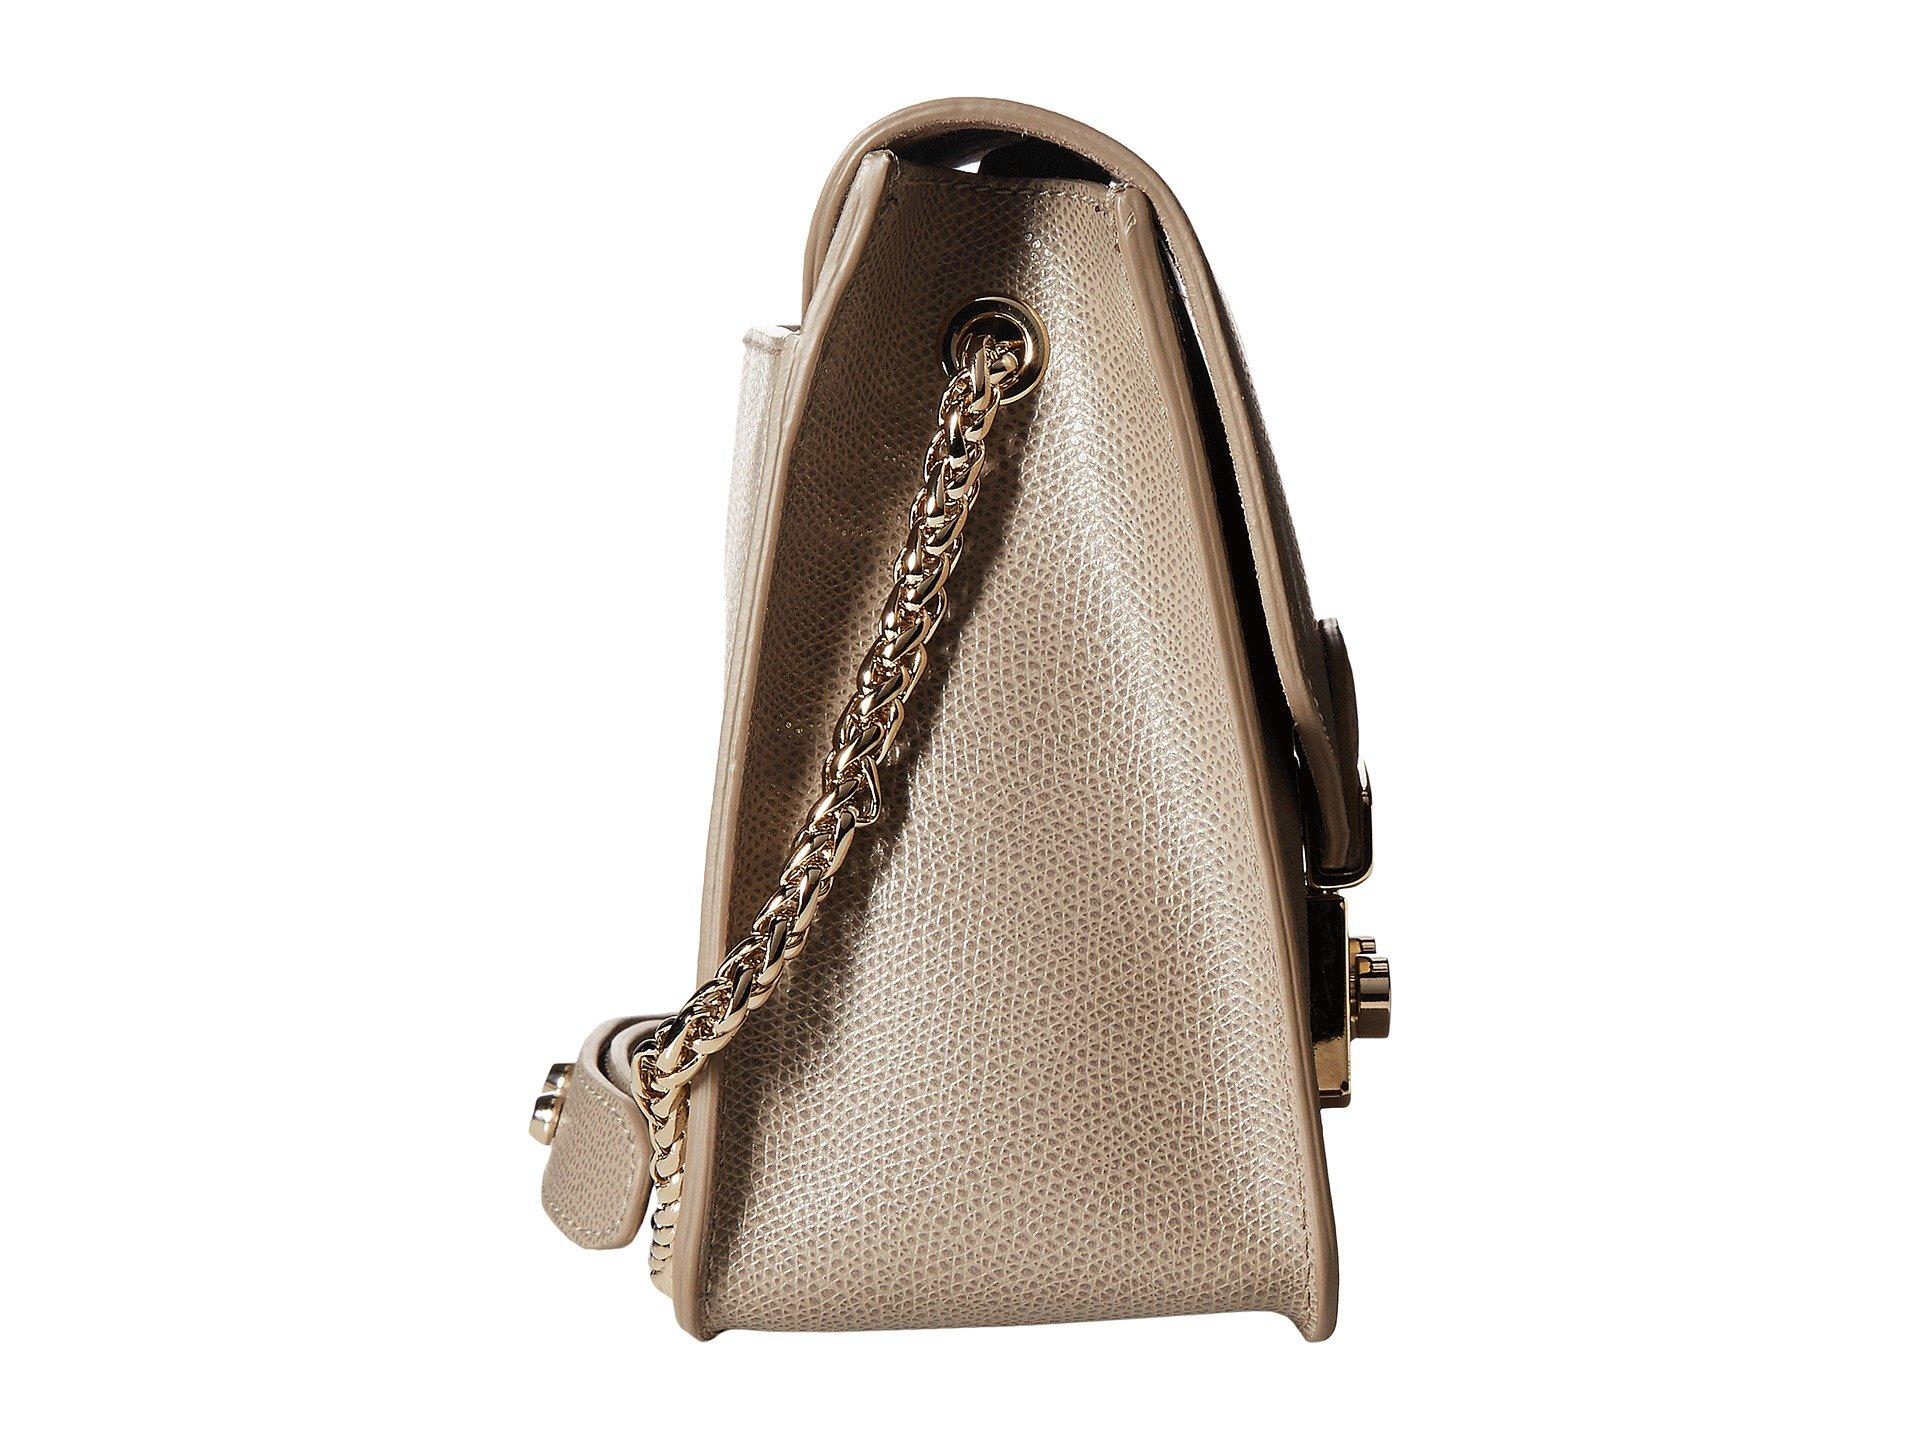 549b641c77e2 Furla Metropolis Small Shoulder Bag at Luxury.Zappos.com